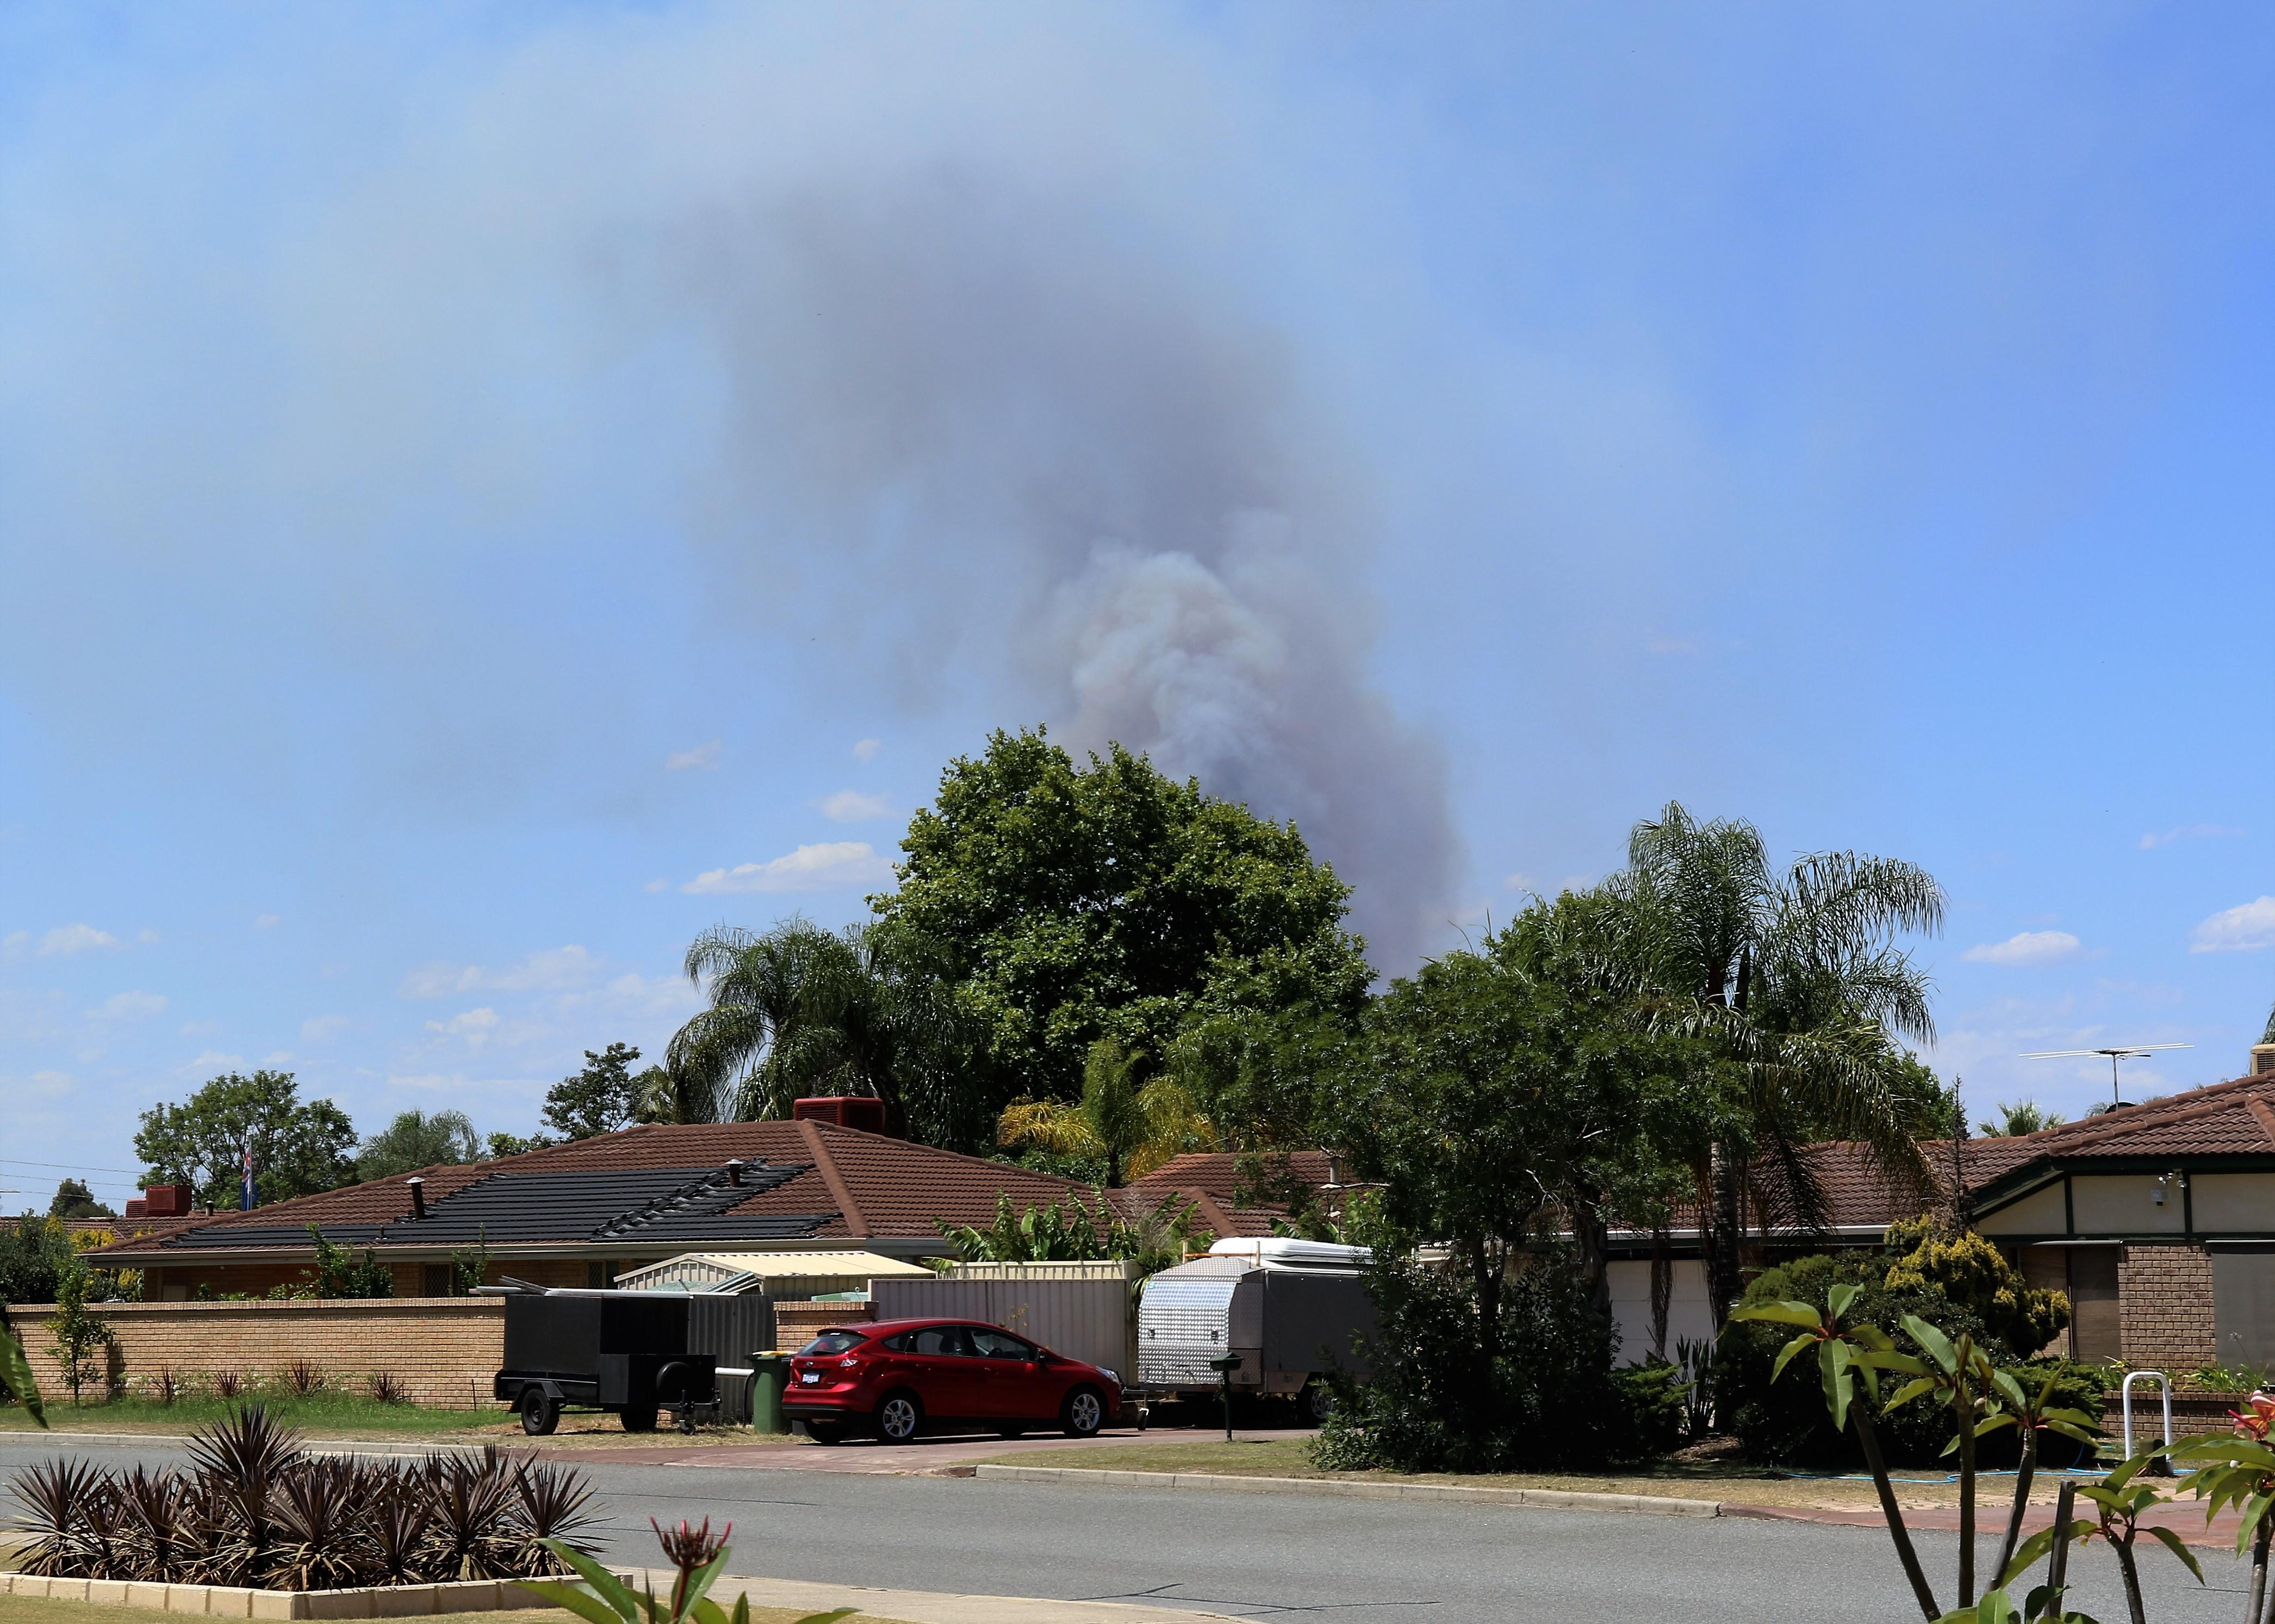 Smoke Plume - Bushfire - Brentwood Road, Kenwick, Perth WA